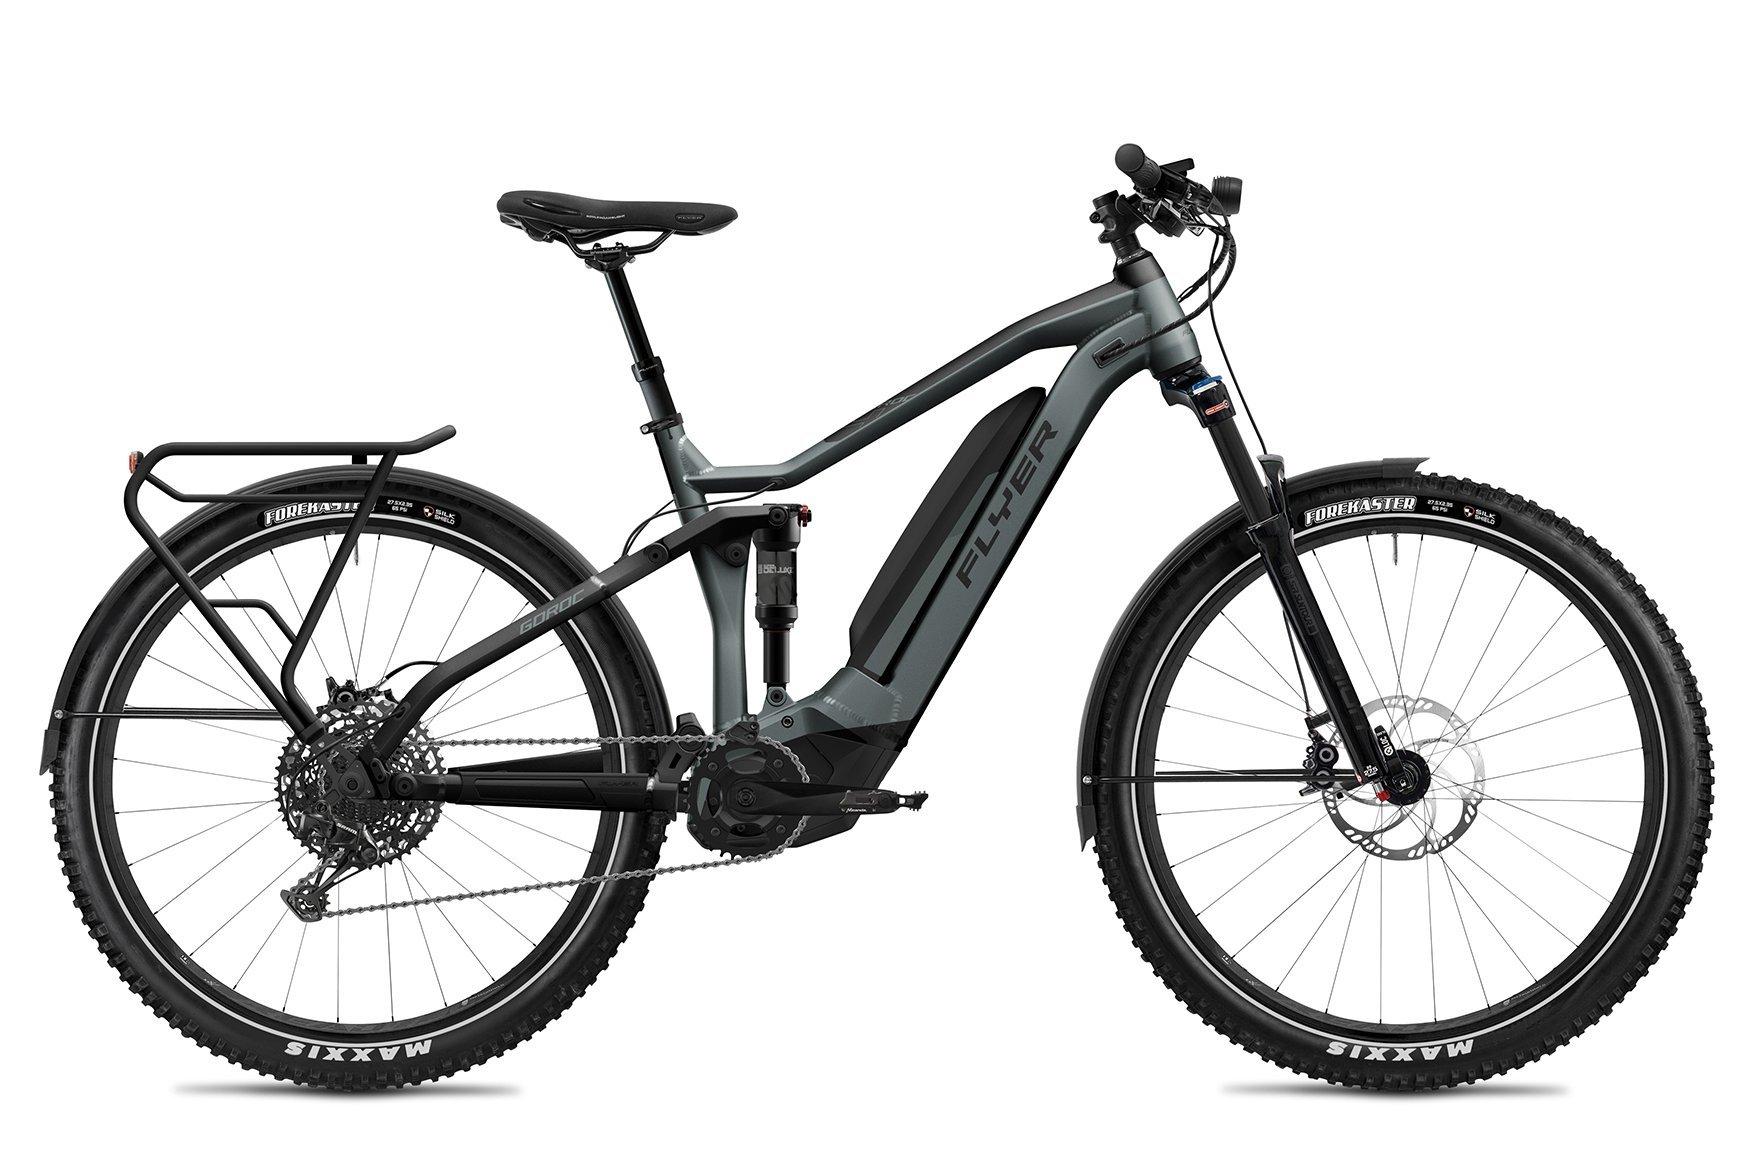 FLYER_E-Bikes_Goroc4_650_Fullsuspension_BlackShadingGlossBlackGloss